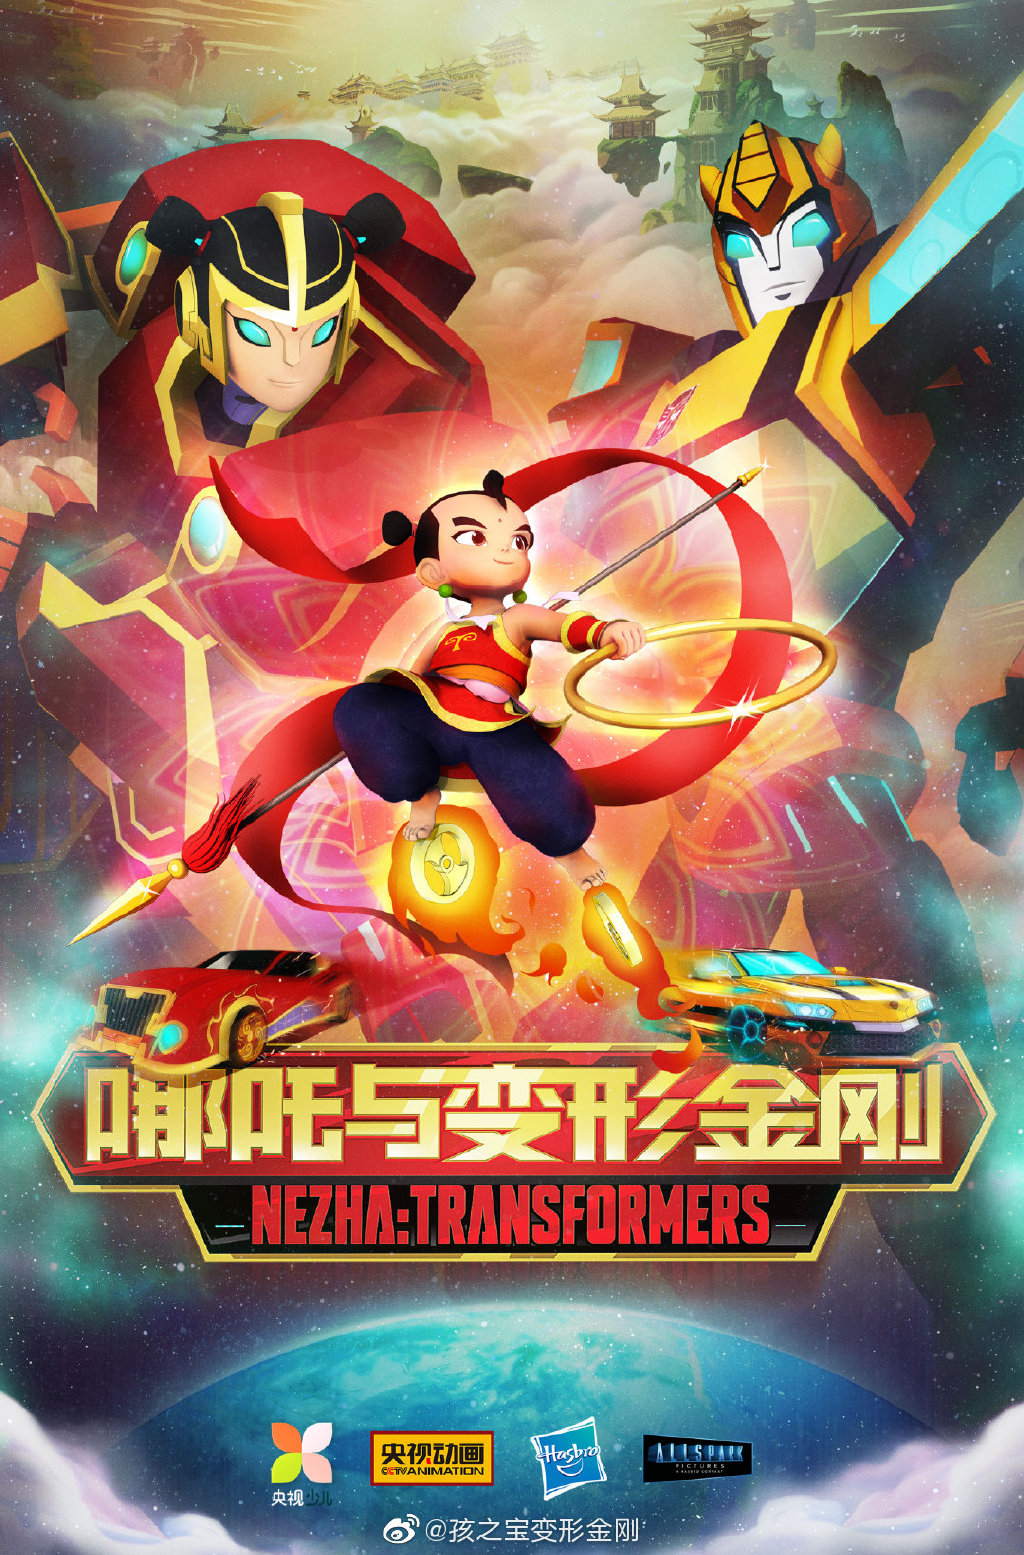 Nezha vs. Transformers: A bizarre animated hybrid